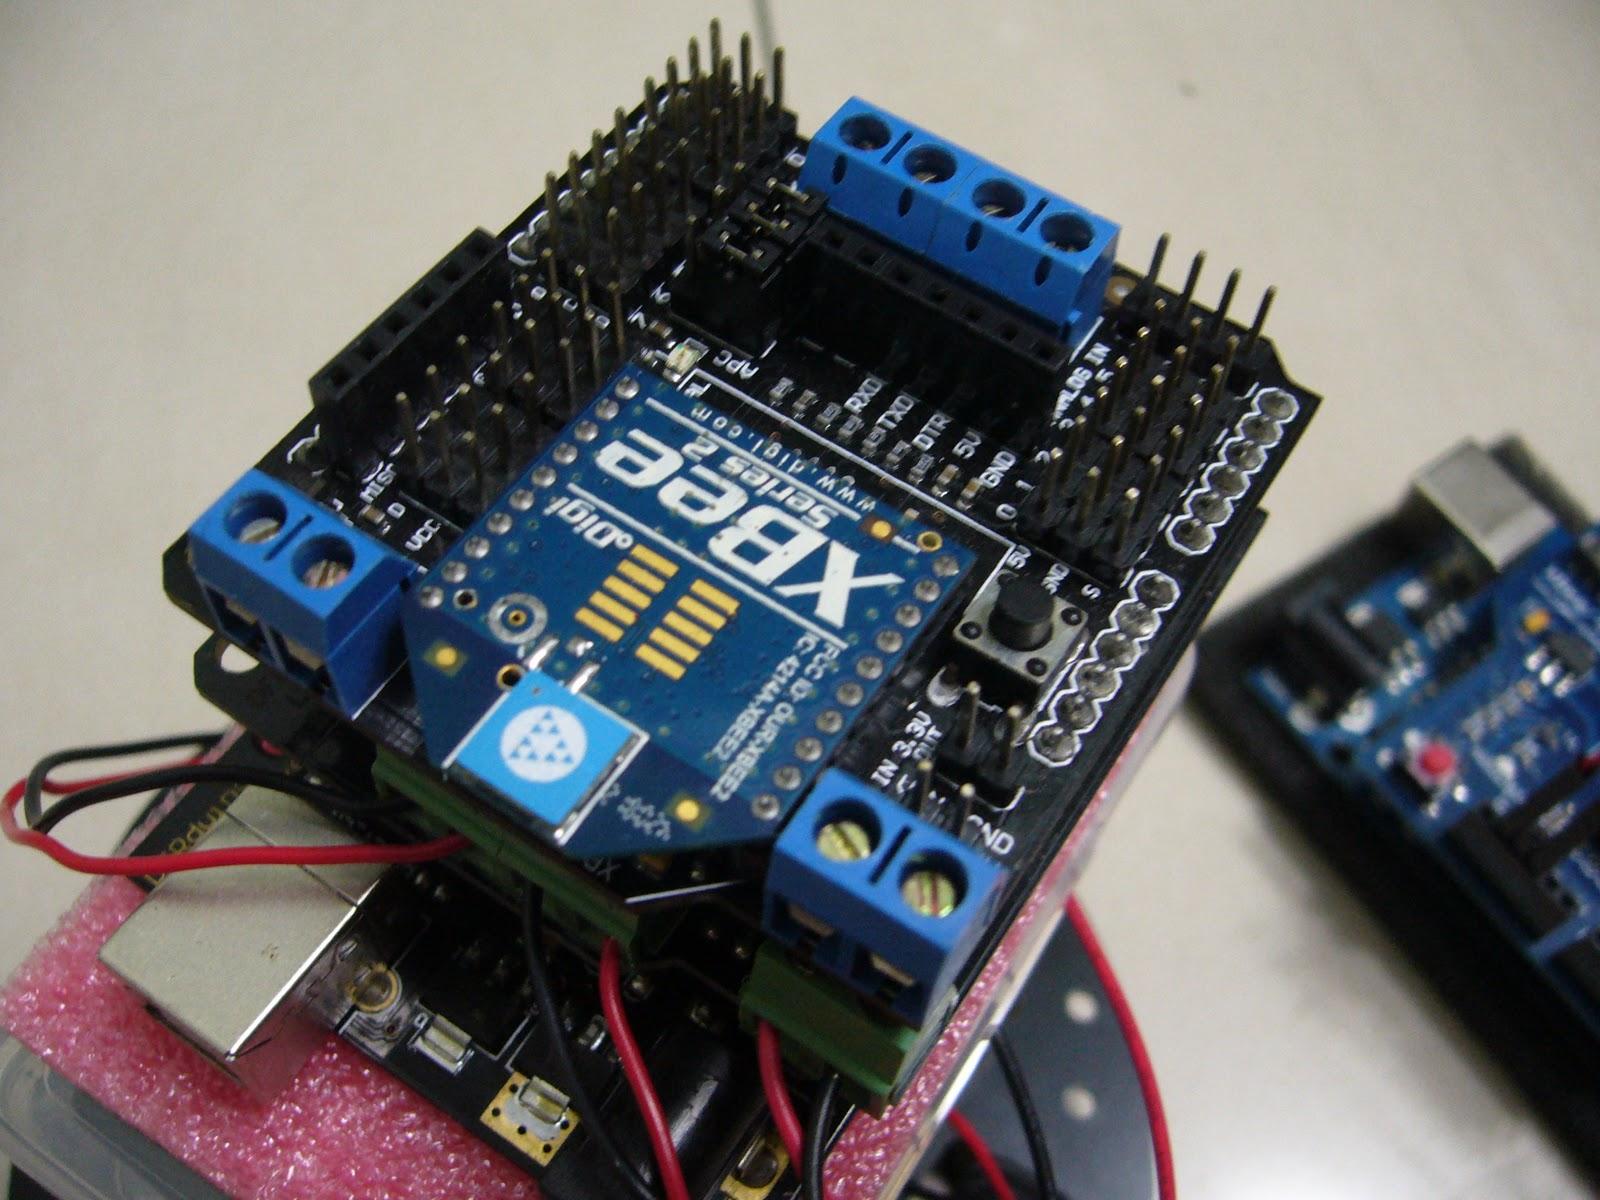 Dennis lab 手機遙控車 arduino xbee zigbee bluetooth